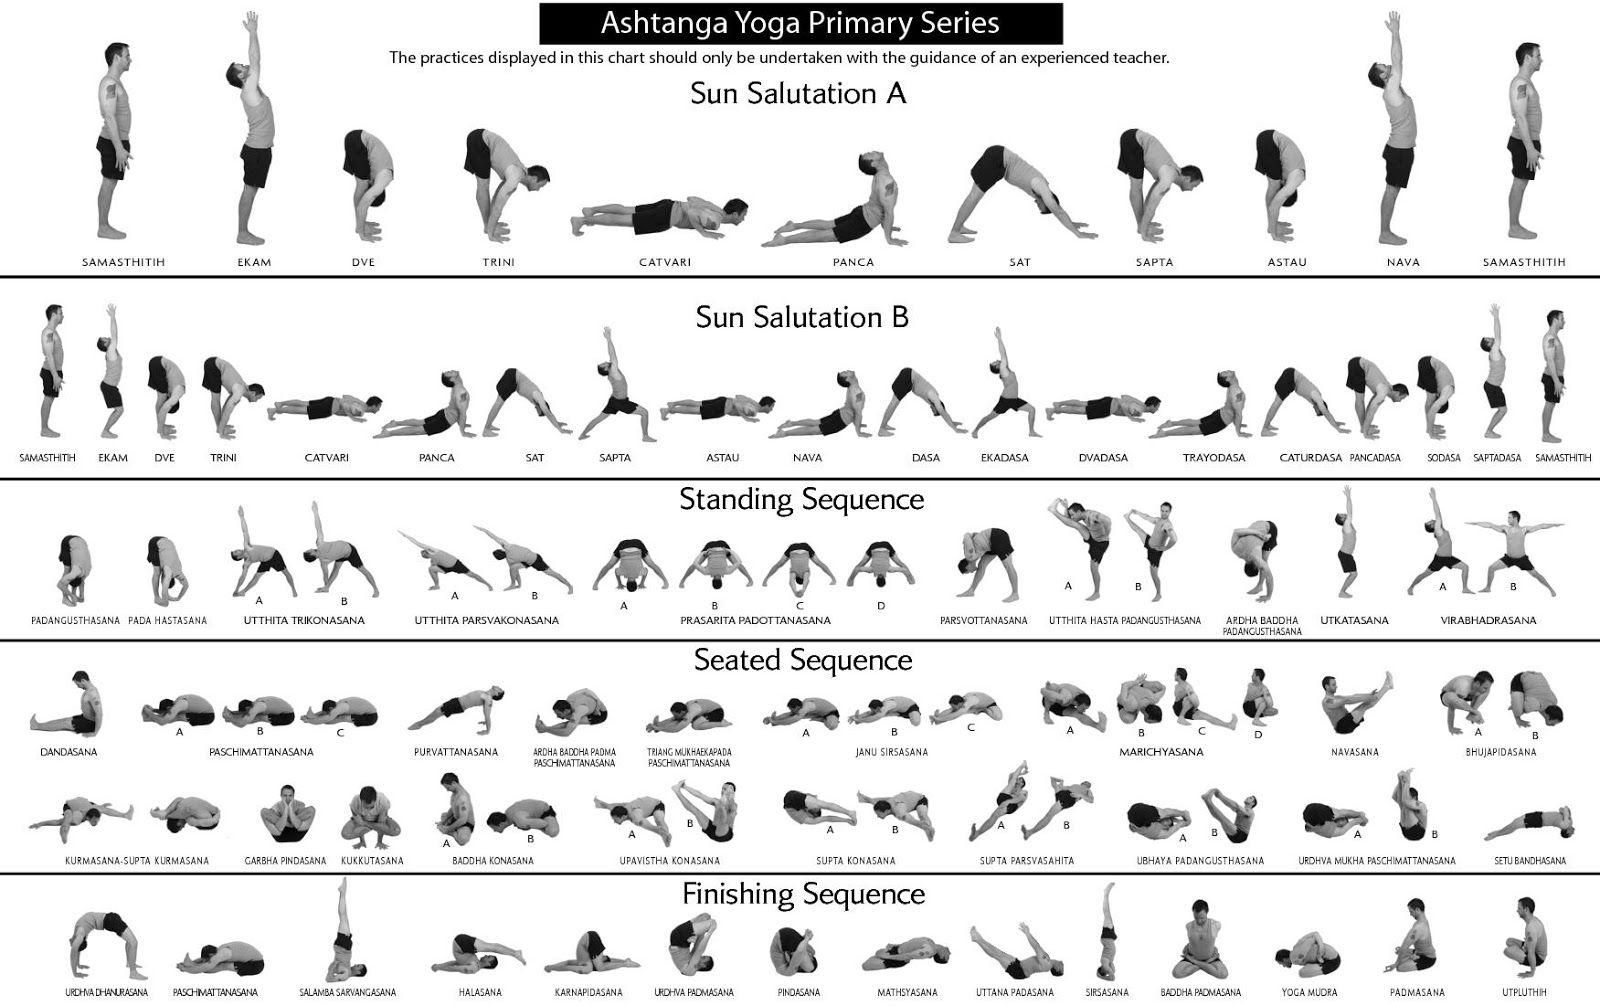 Primeira série - Ashtanga Vinyasa Yoga | Yoga | Yoga ...